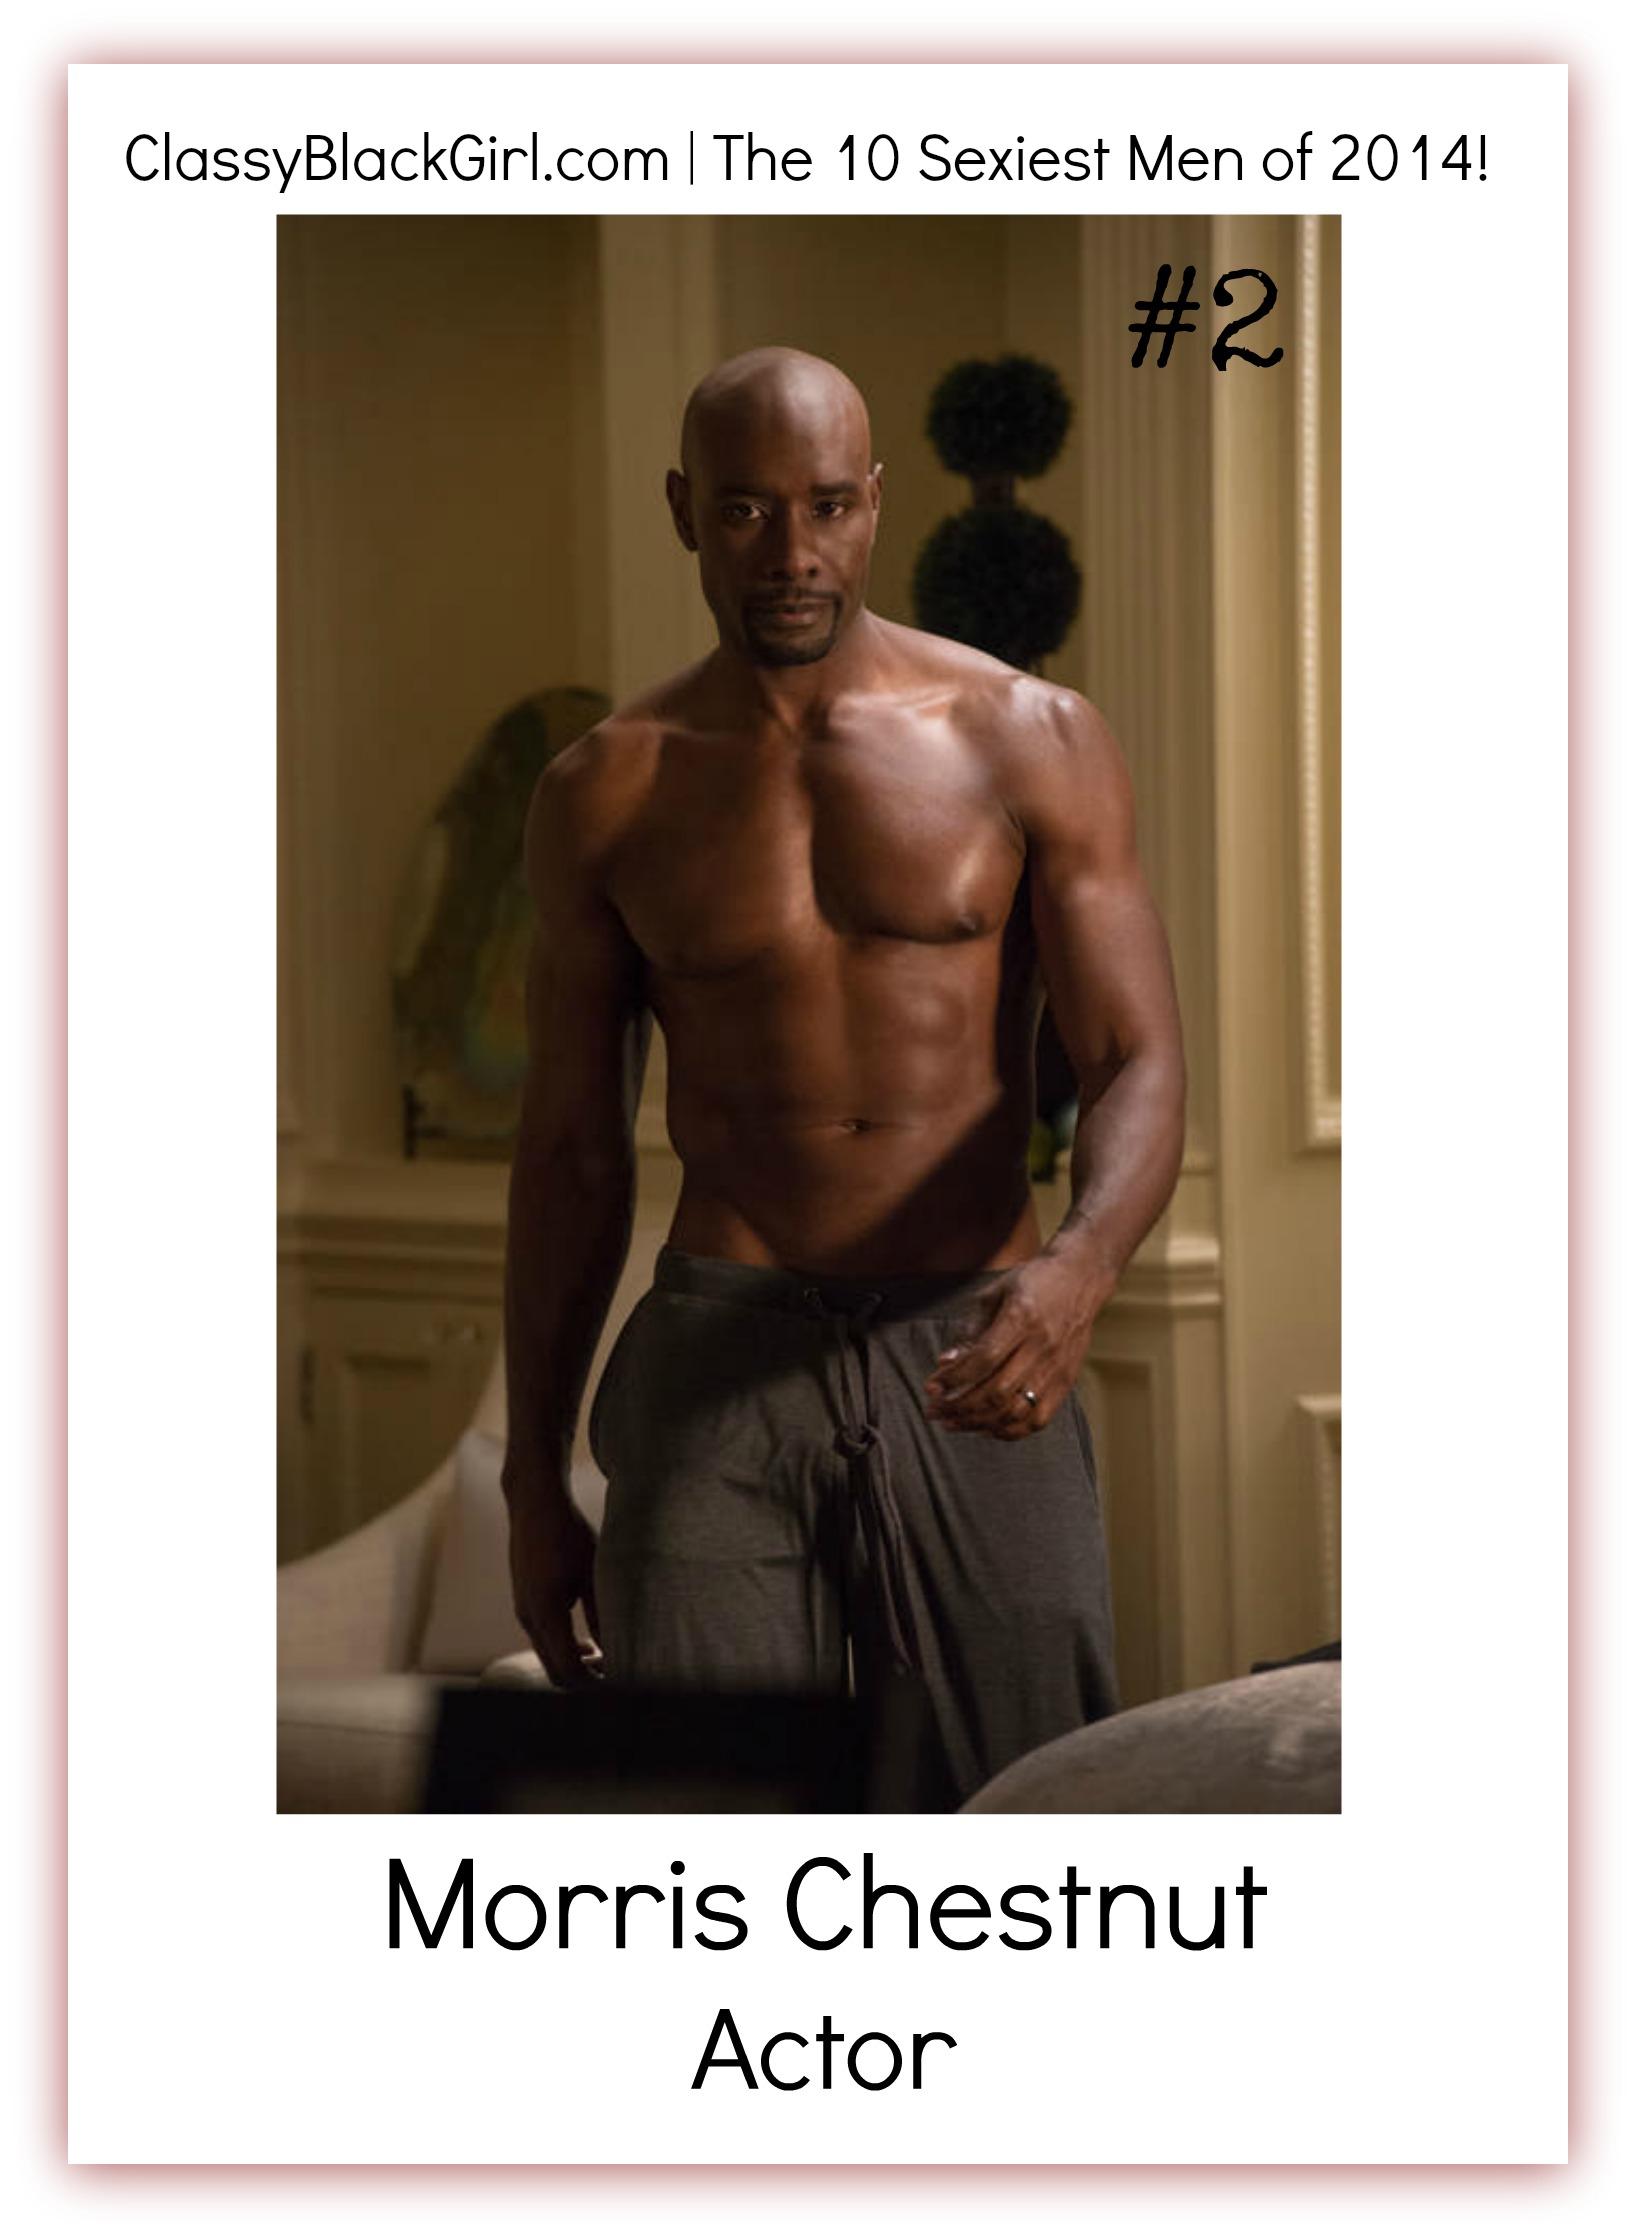 Morris Chestnut Use